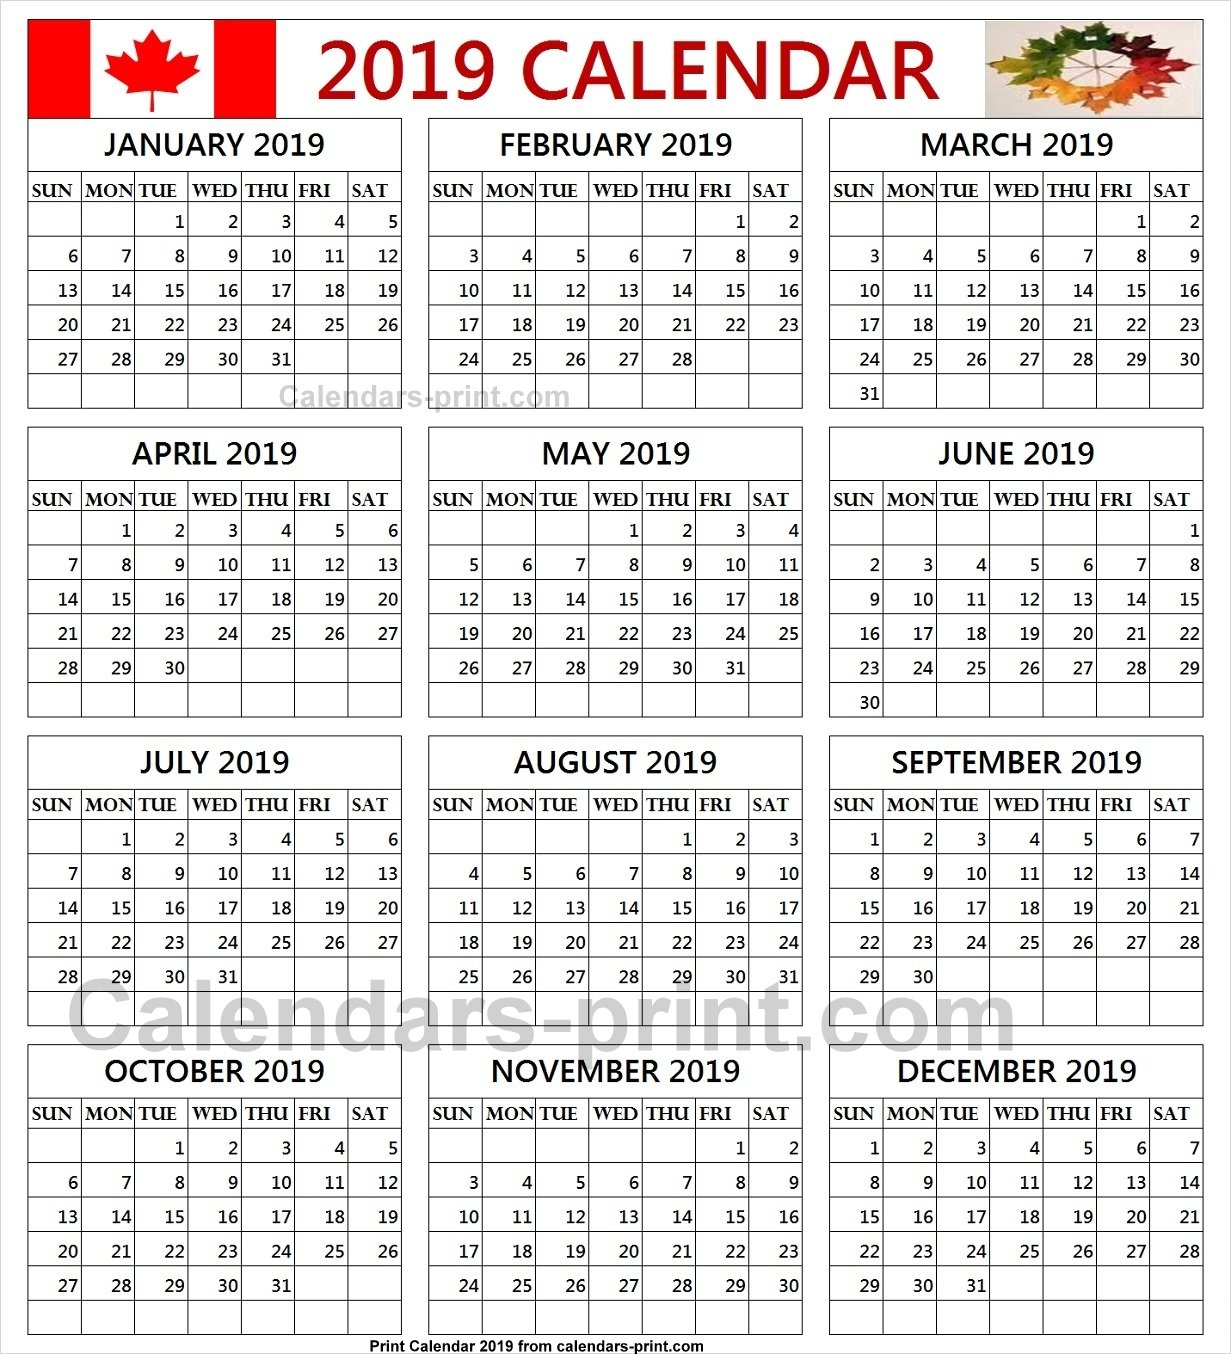 Free Calendar 2019 Canada Printable Template With Notes | Holidays Calendar Of 2019 Canada